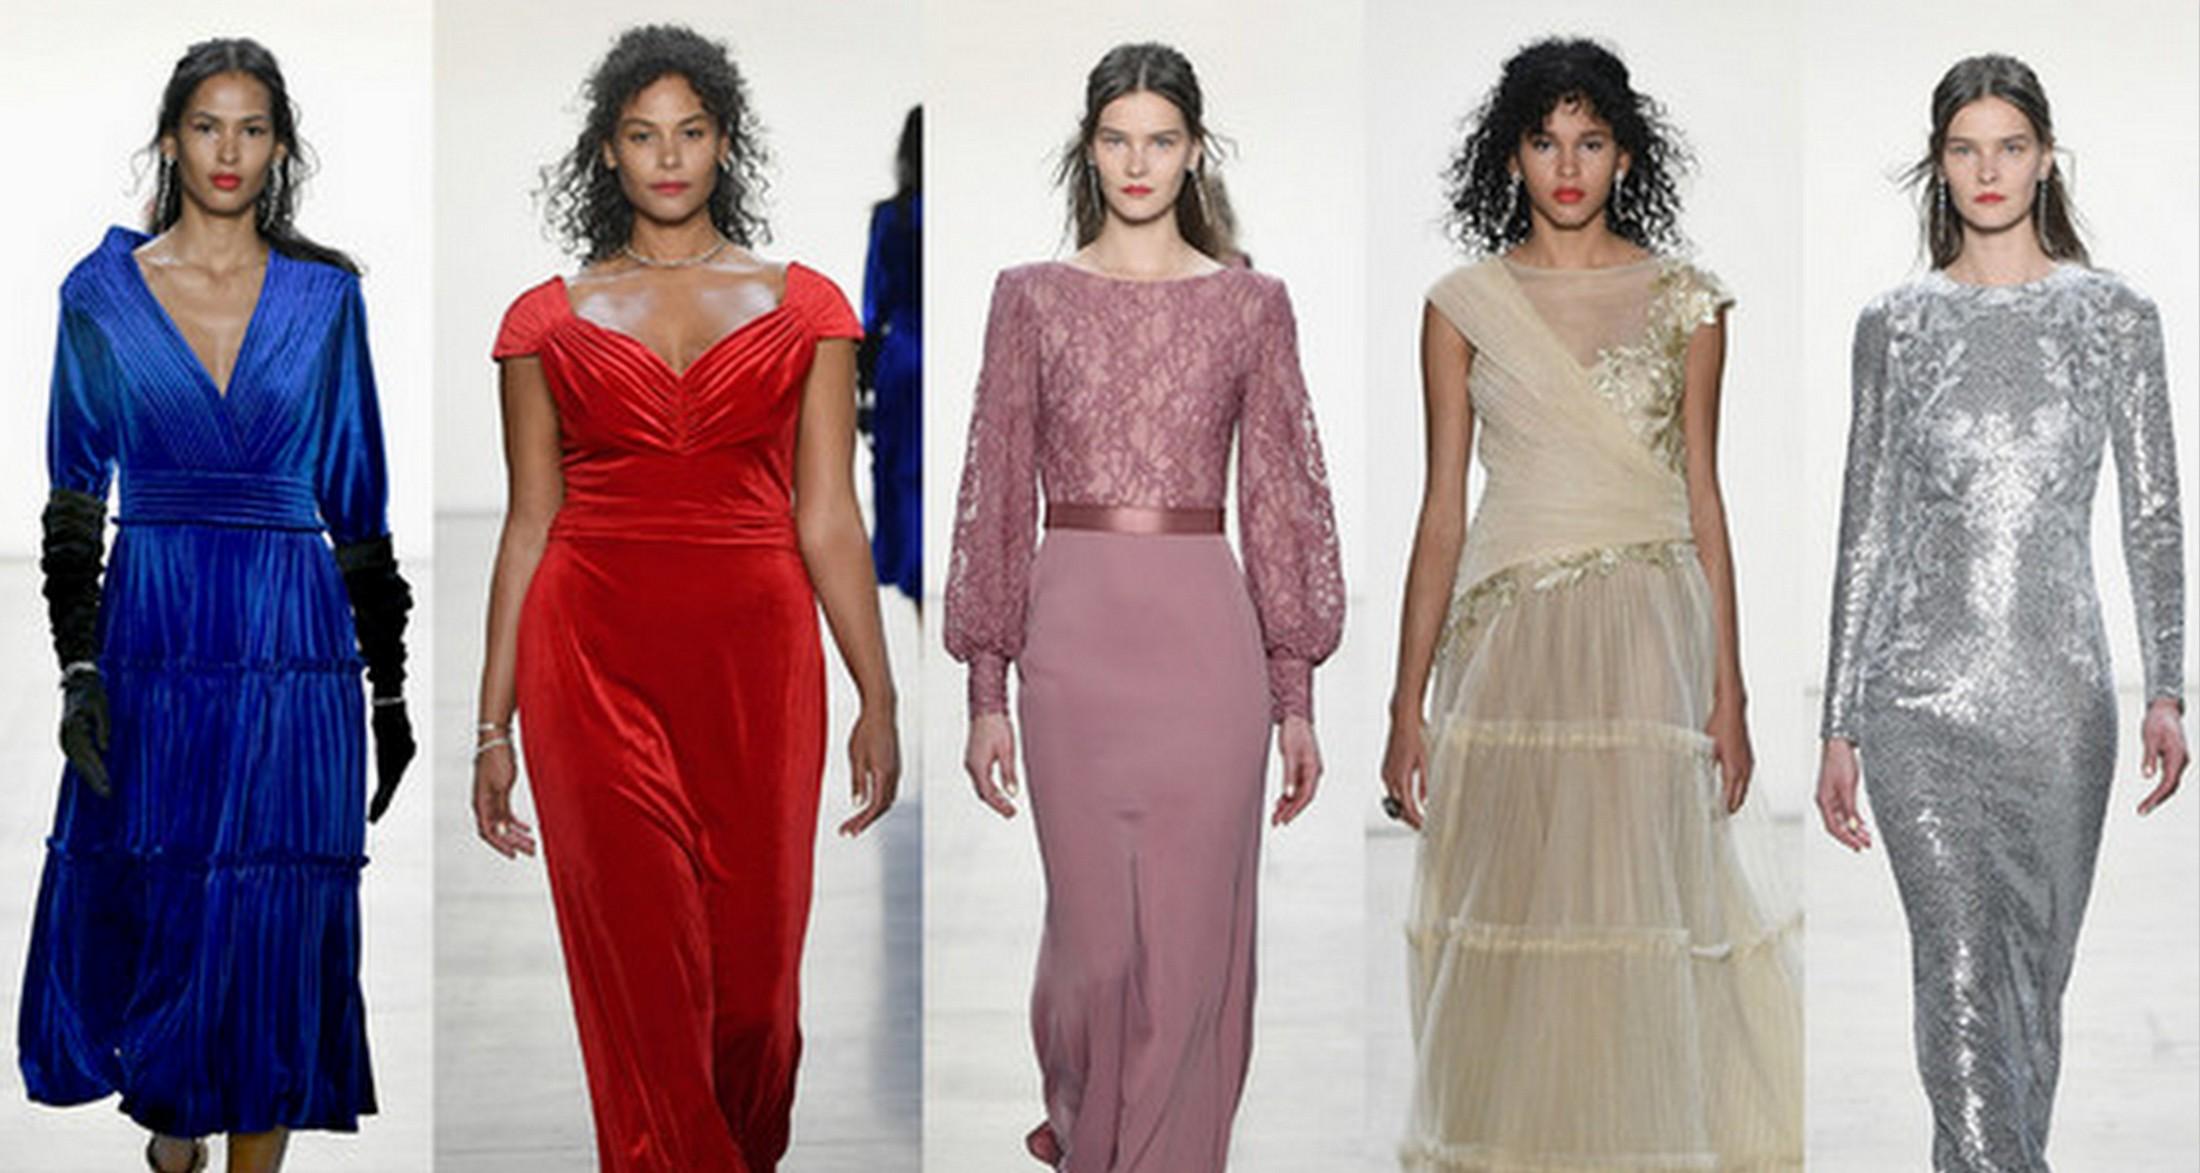 Pantone Color Trend Report New York Fashion Week Autumn/Winter 2019/2020